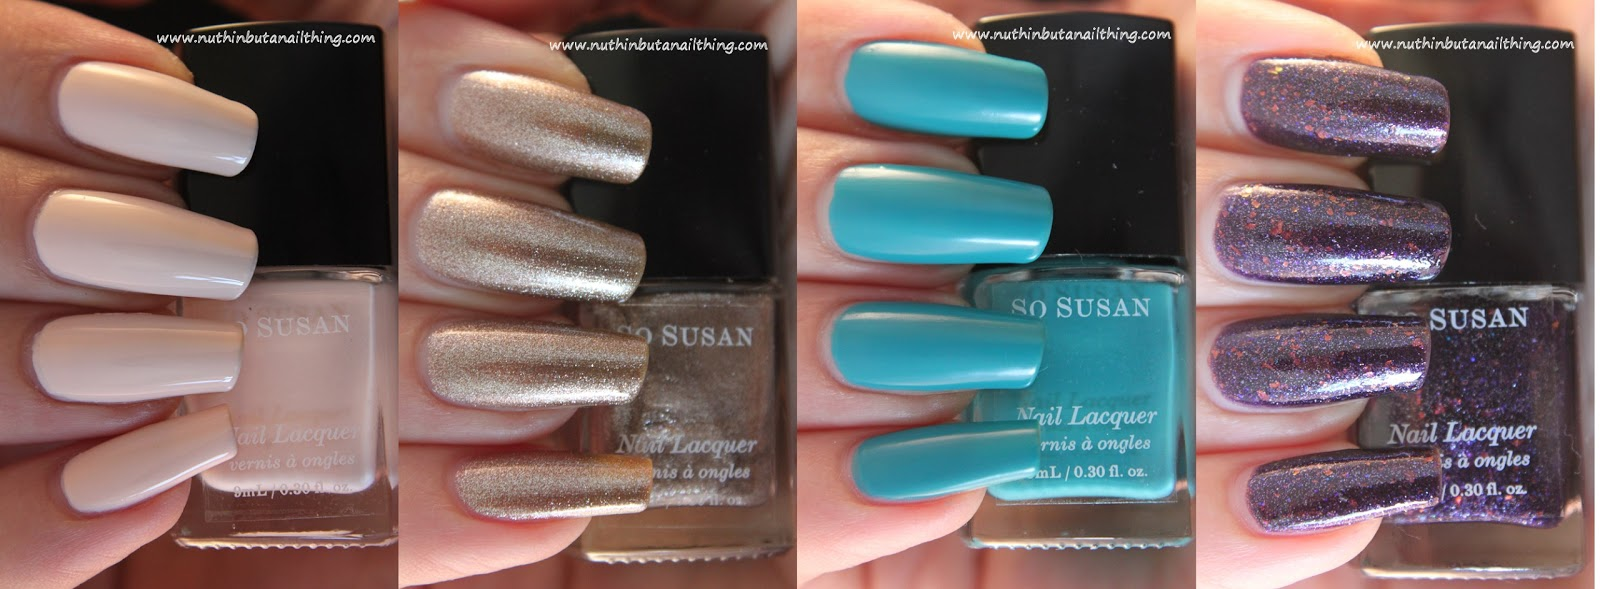 So Susan Cosmetics Box Review